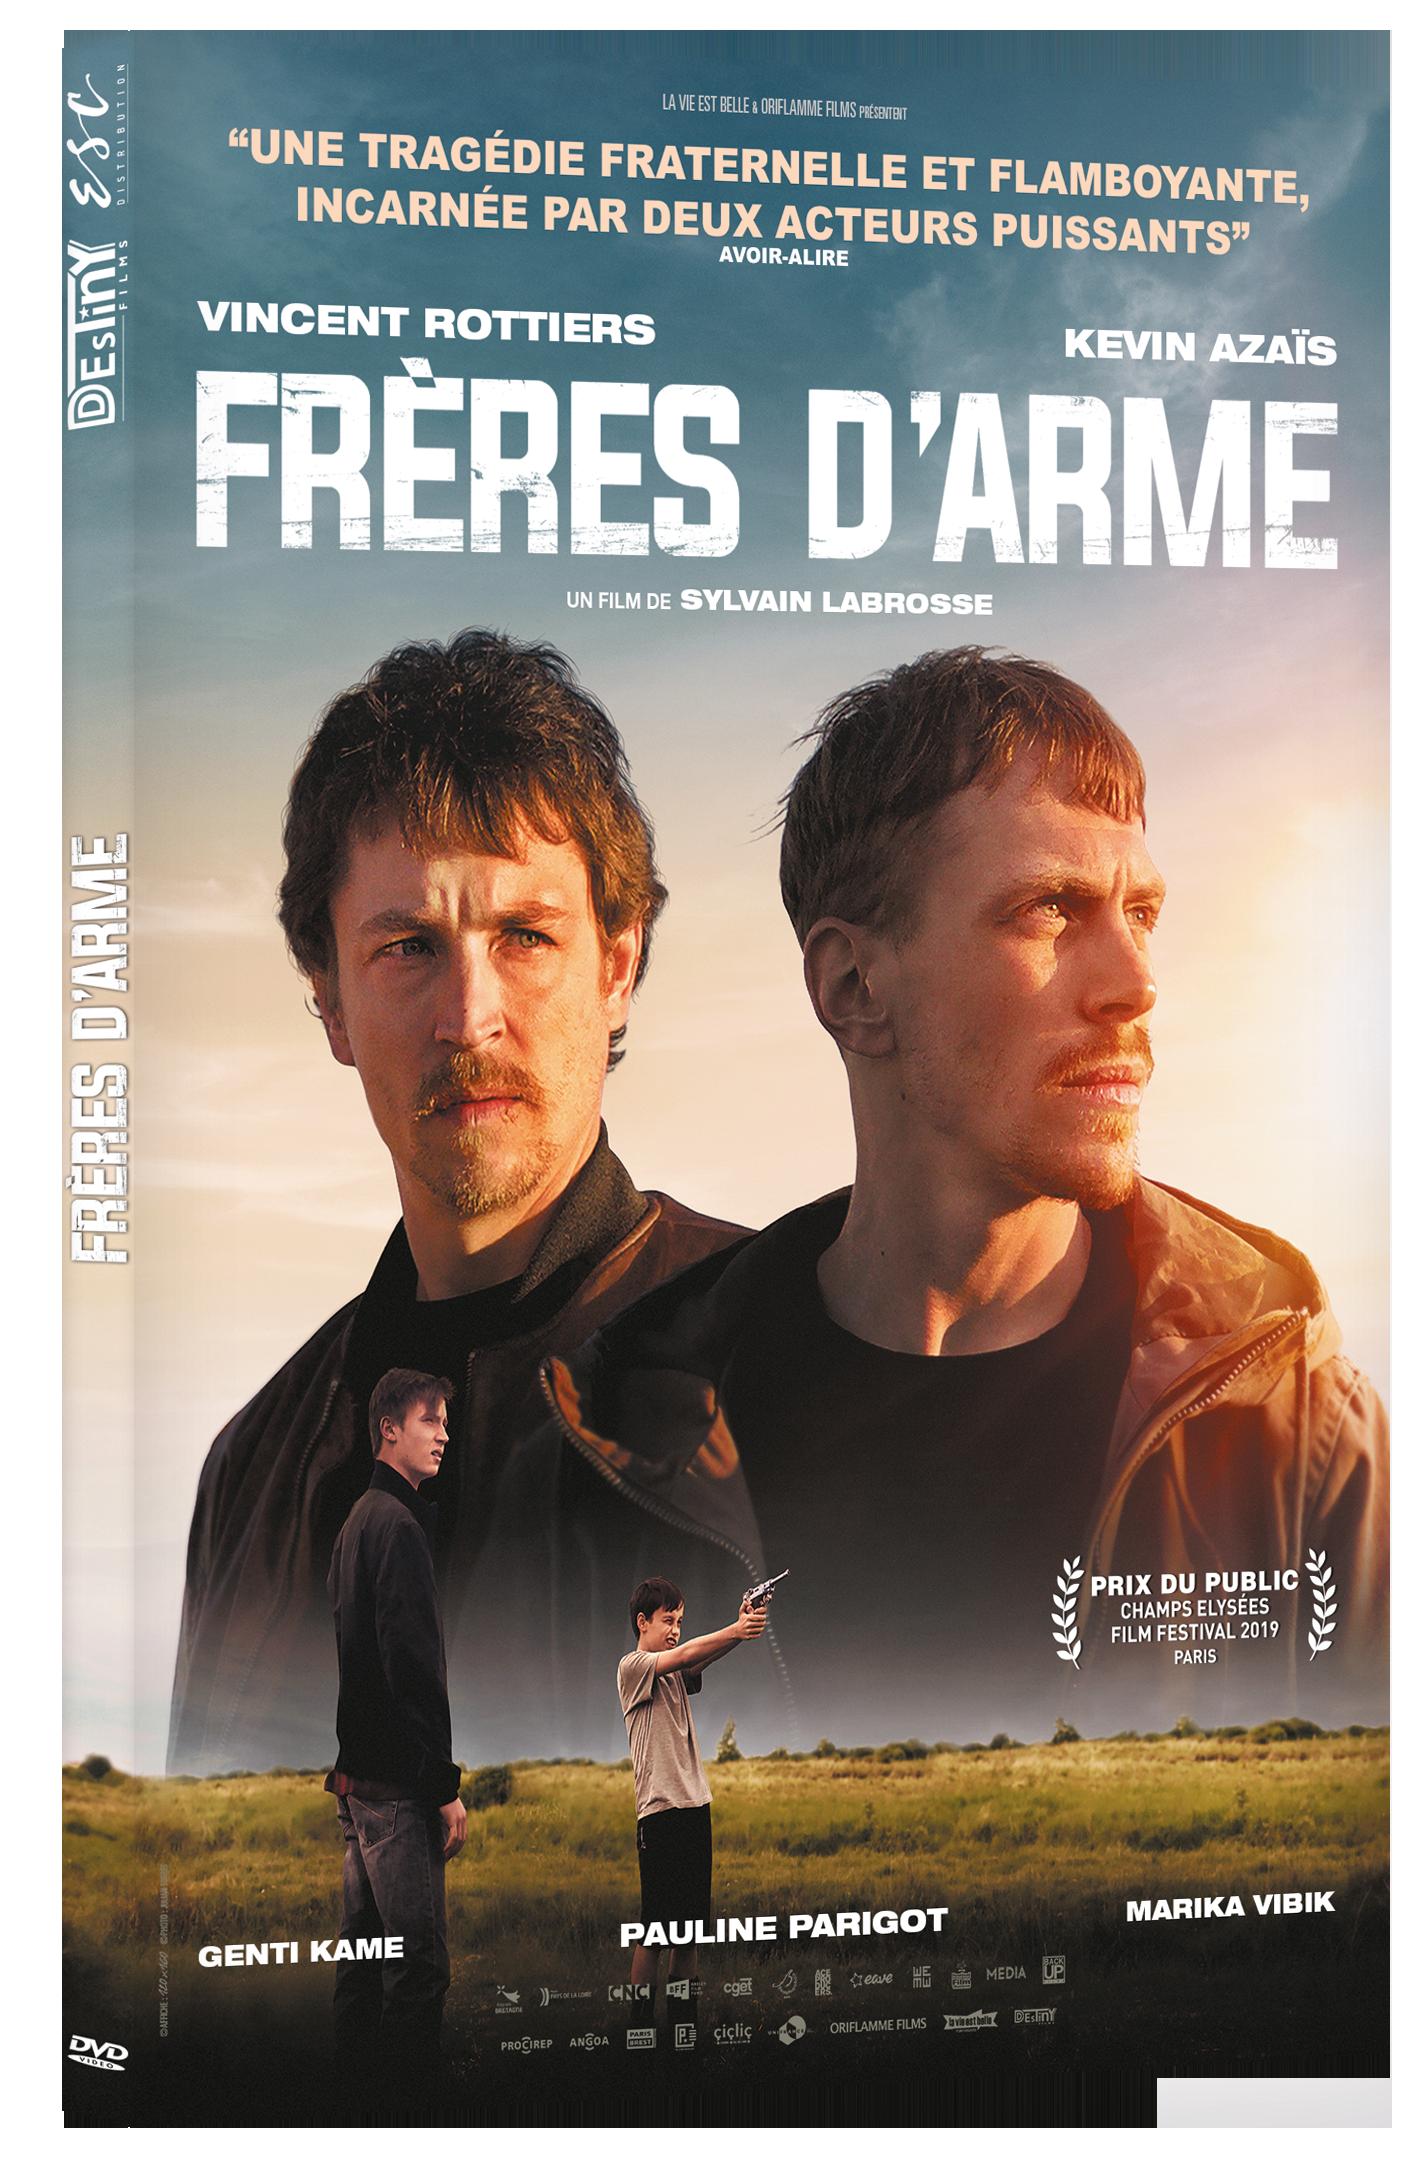 FRERES D'ARME